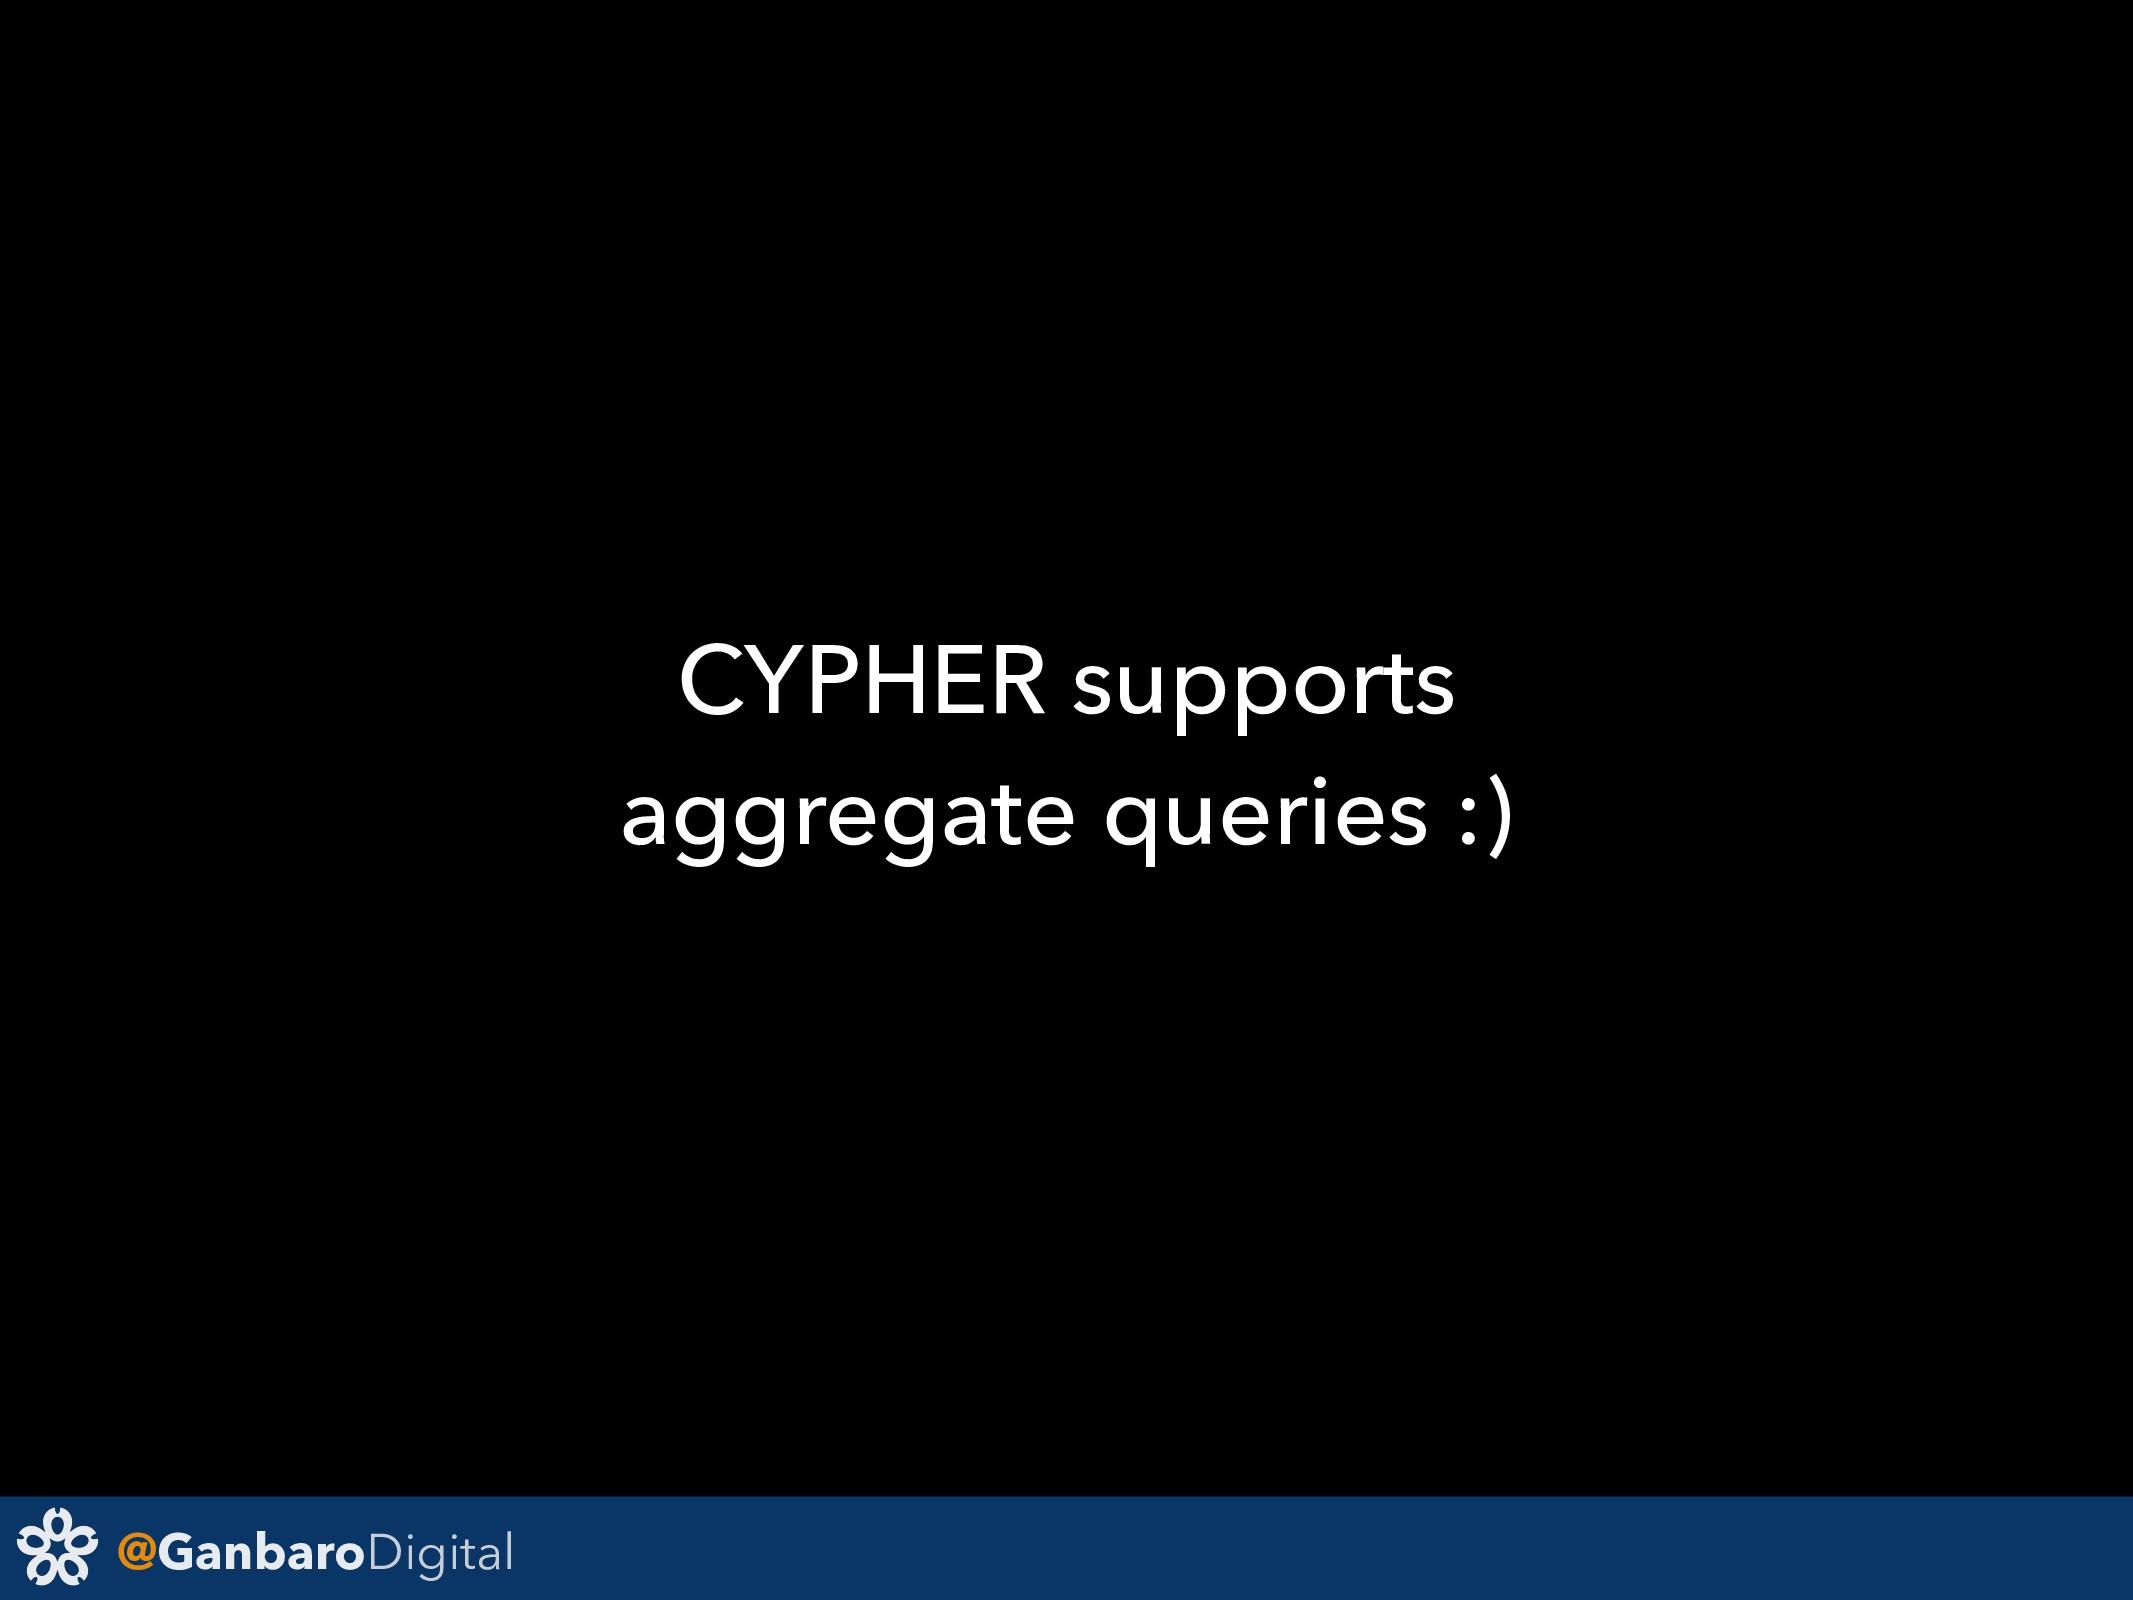 @GanbaroDigital CYPHER supports aggregate queri...